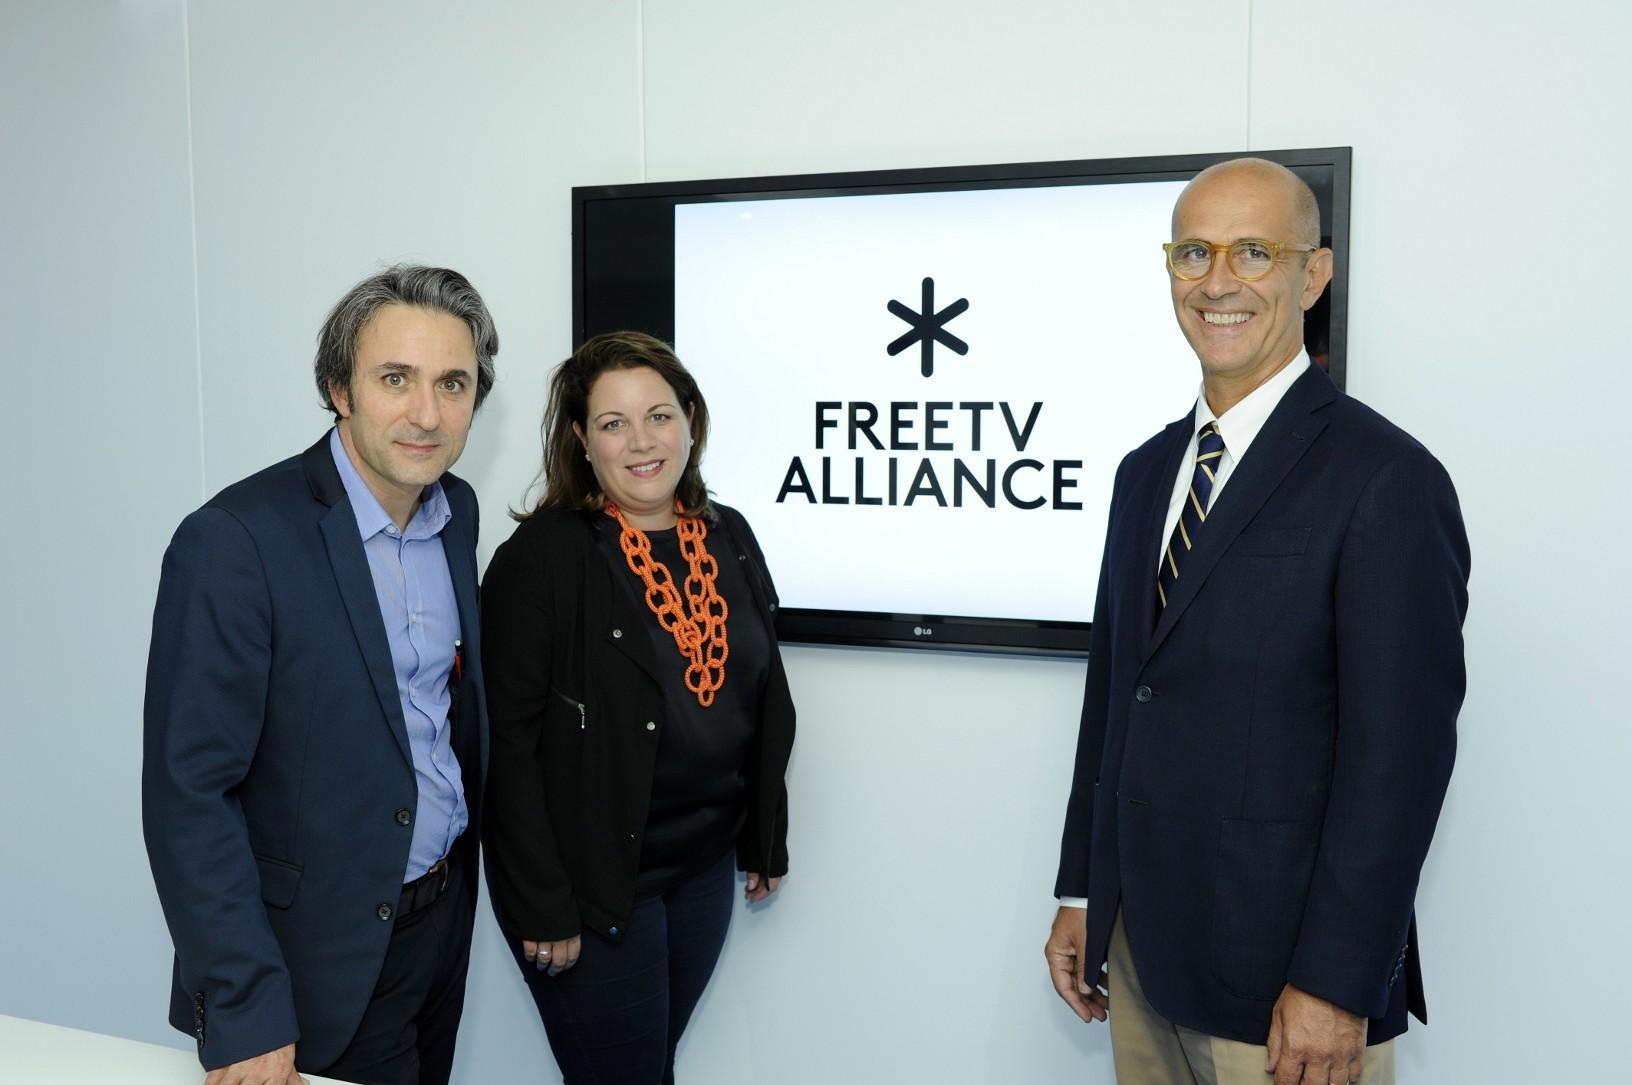 Free TV Alliance